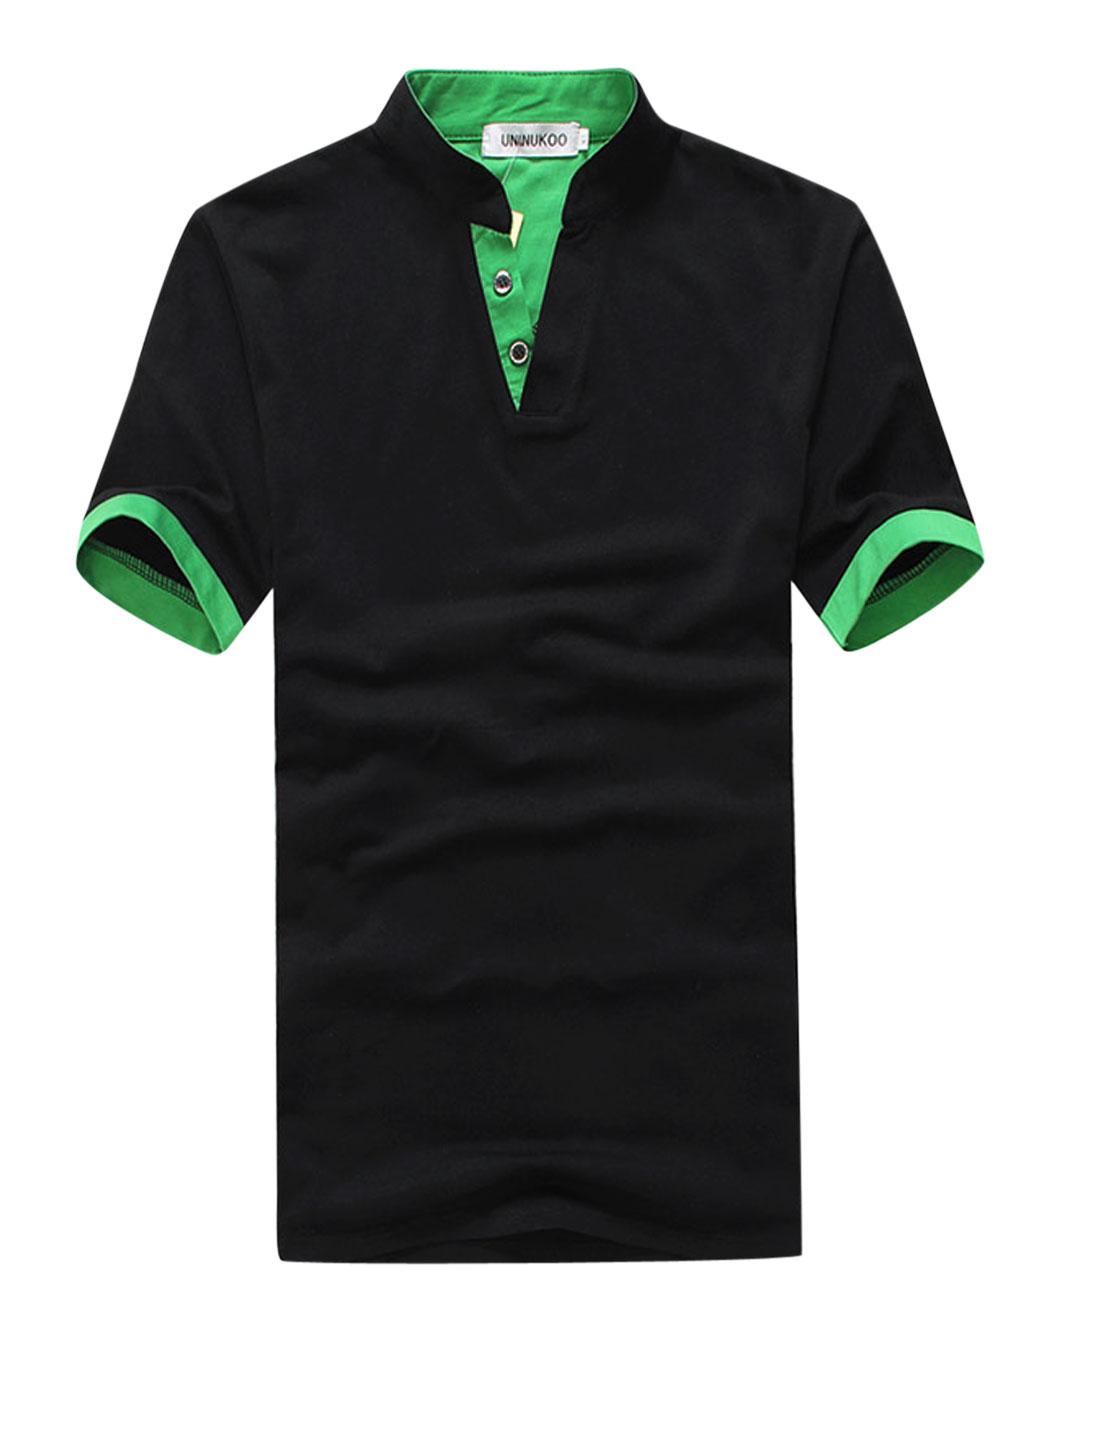 Men Stand Collar Panel 3/4 Placket Trendy Slim Tee Shirt Black M